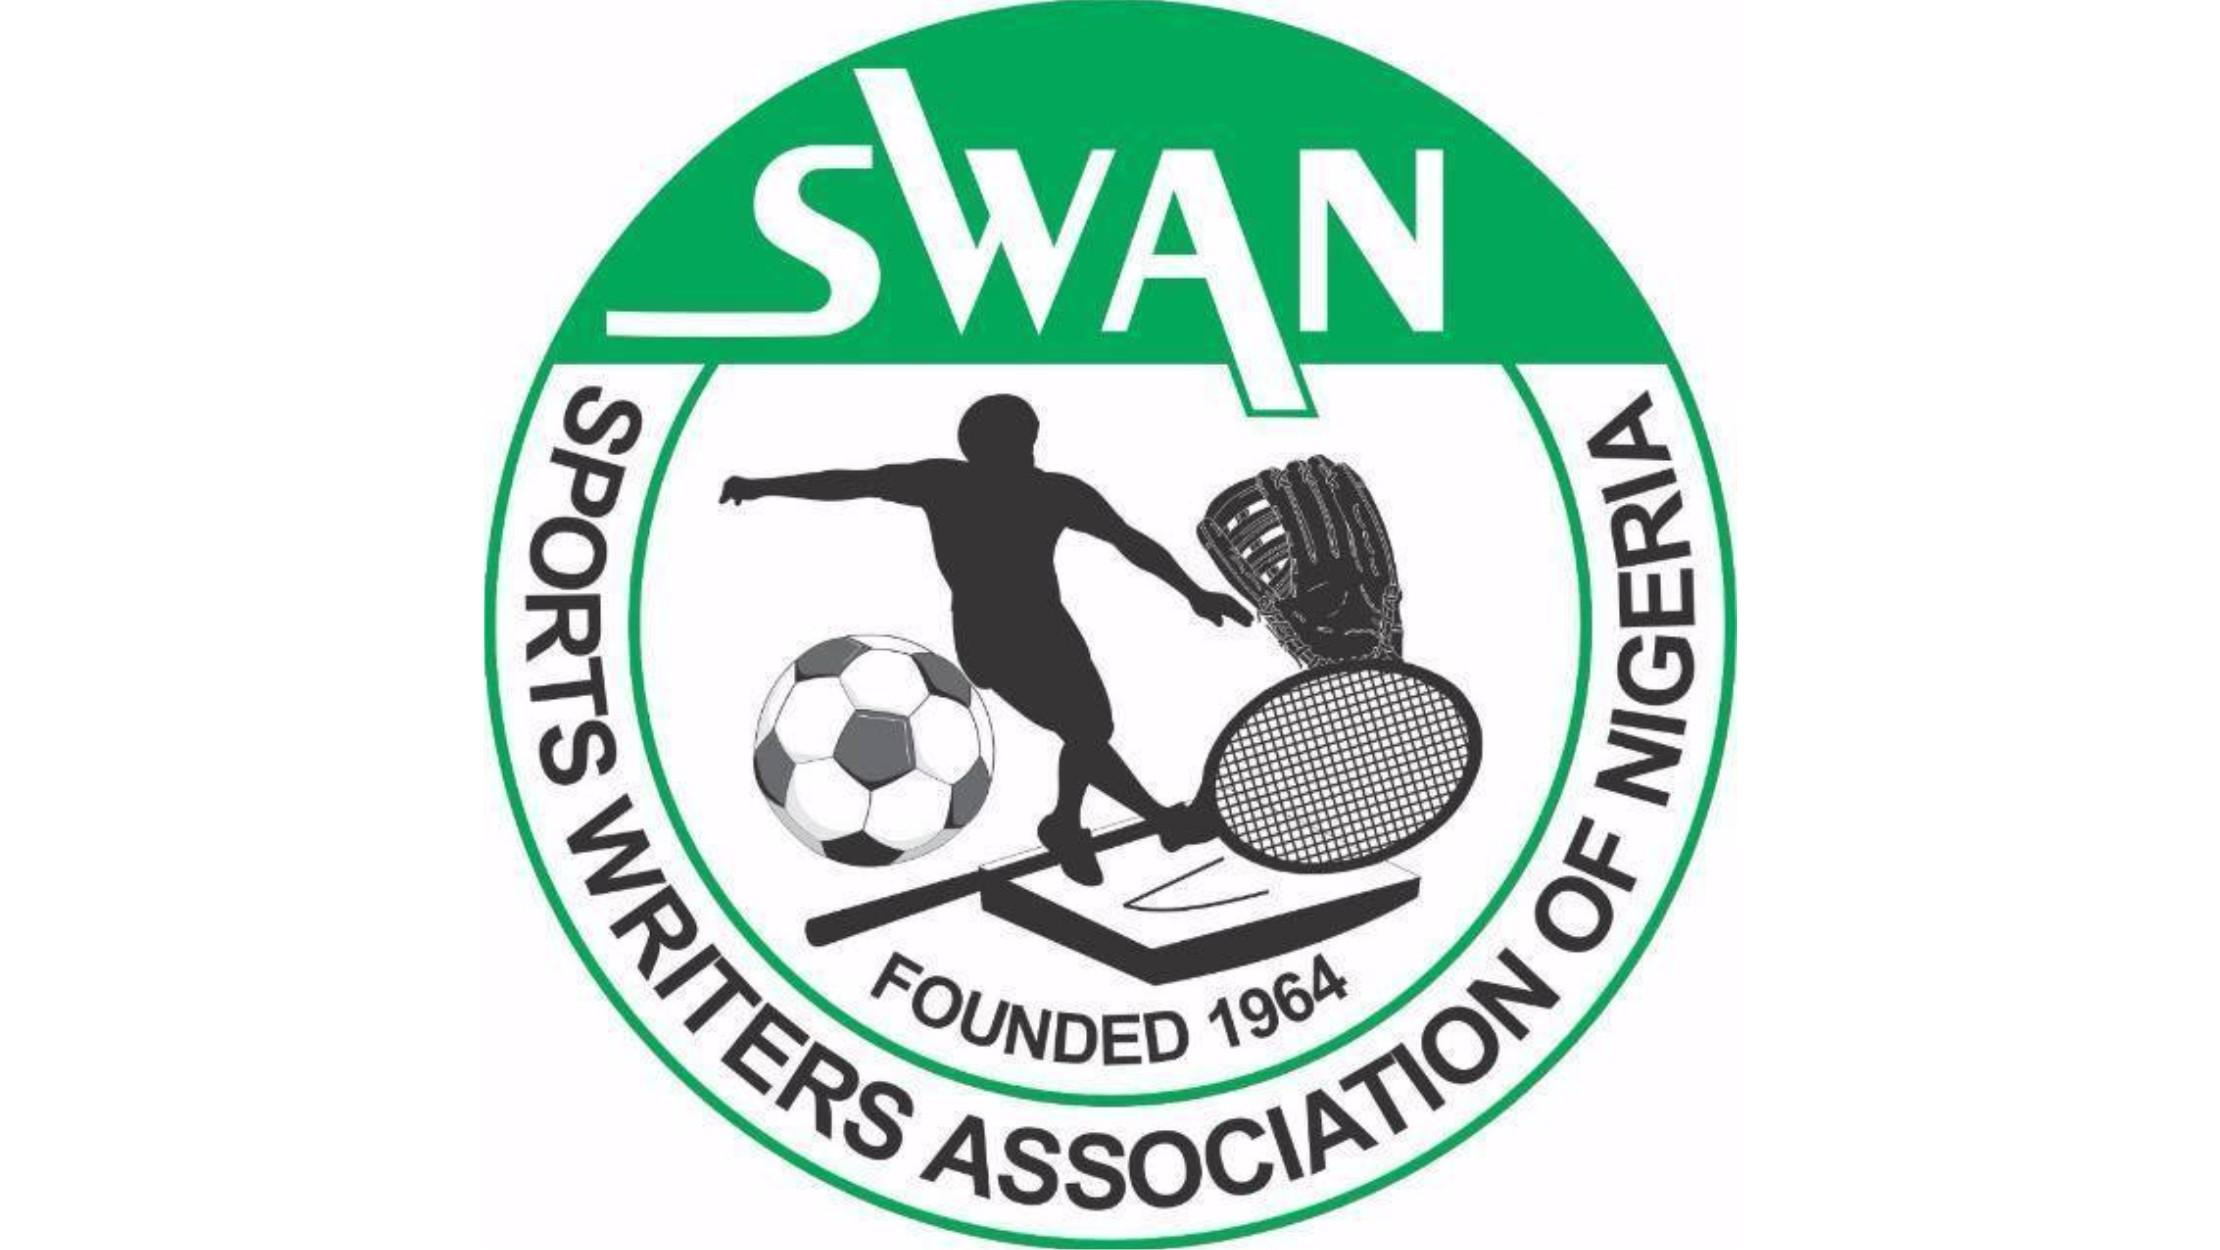 Borno SWAN Mourns Dozens Killed In Football Viewing Centre